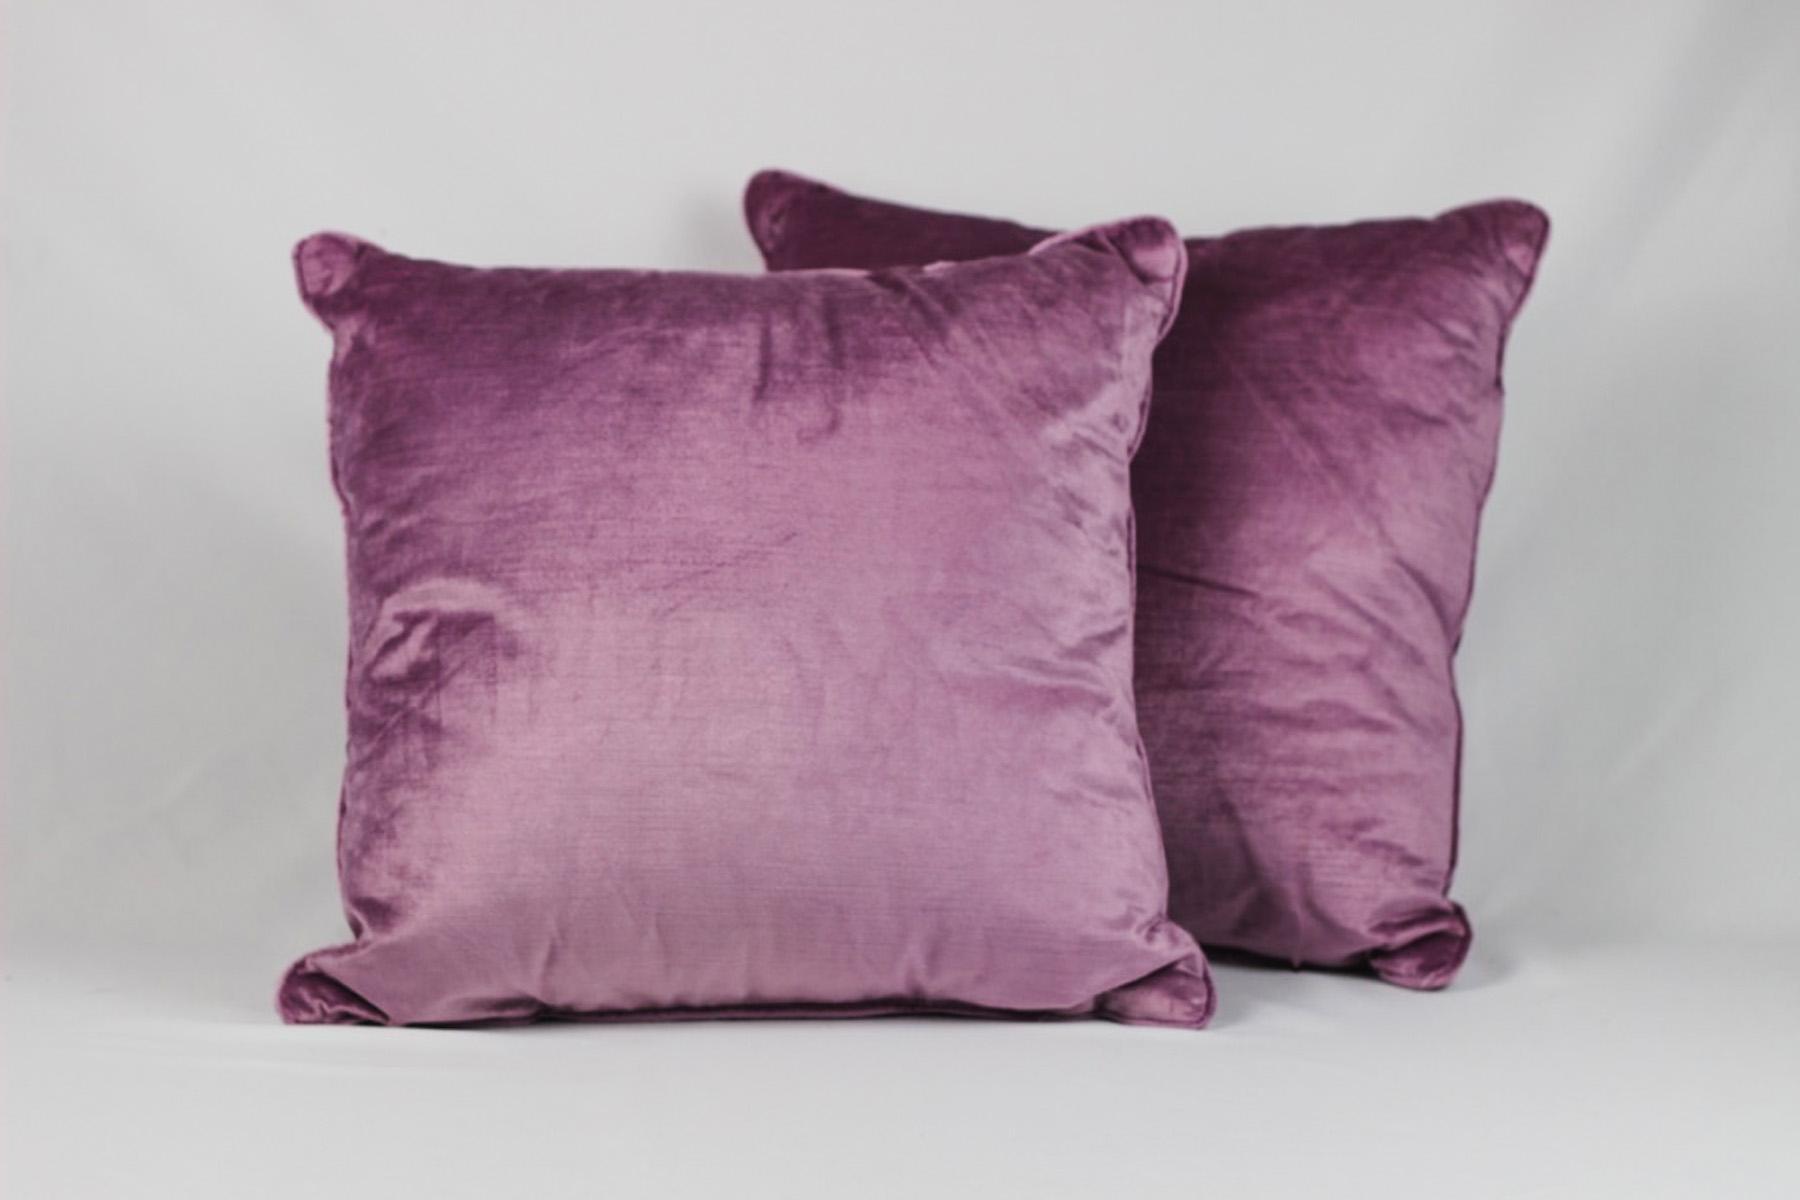 Orchid Velvet Pillows - Scavenged Vintage Rentals.jpg